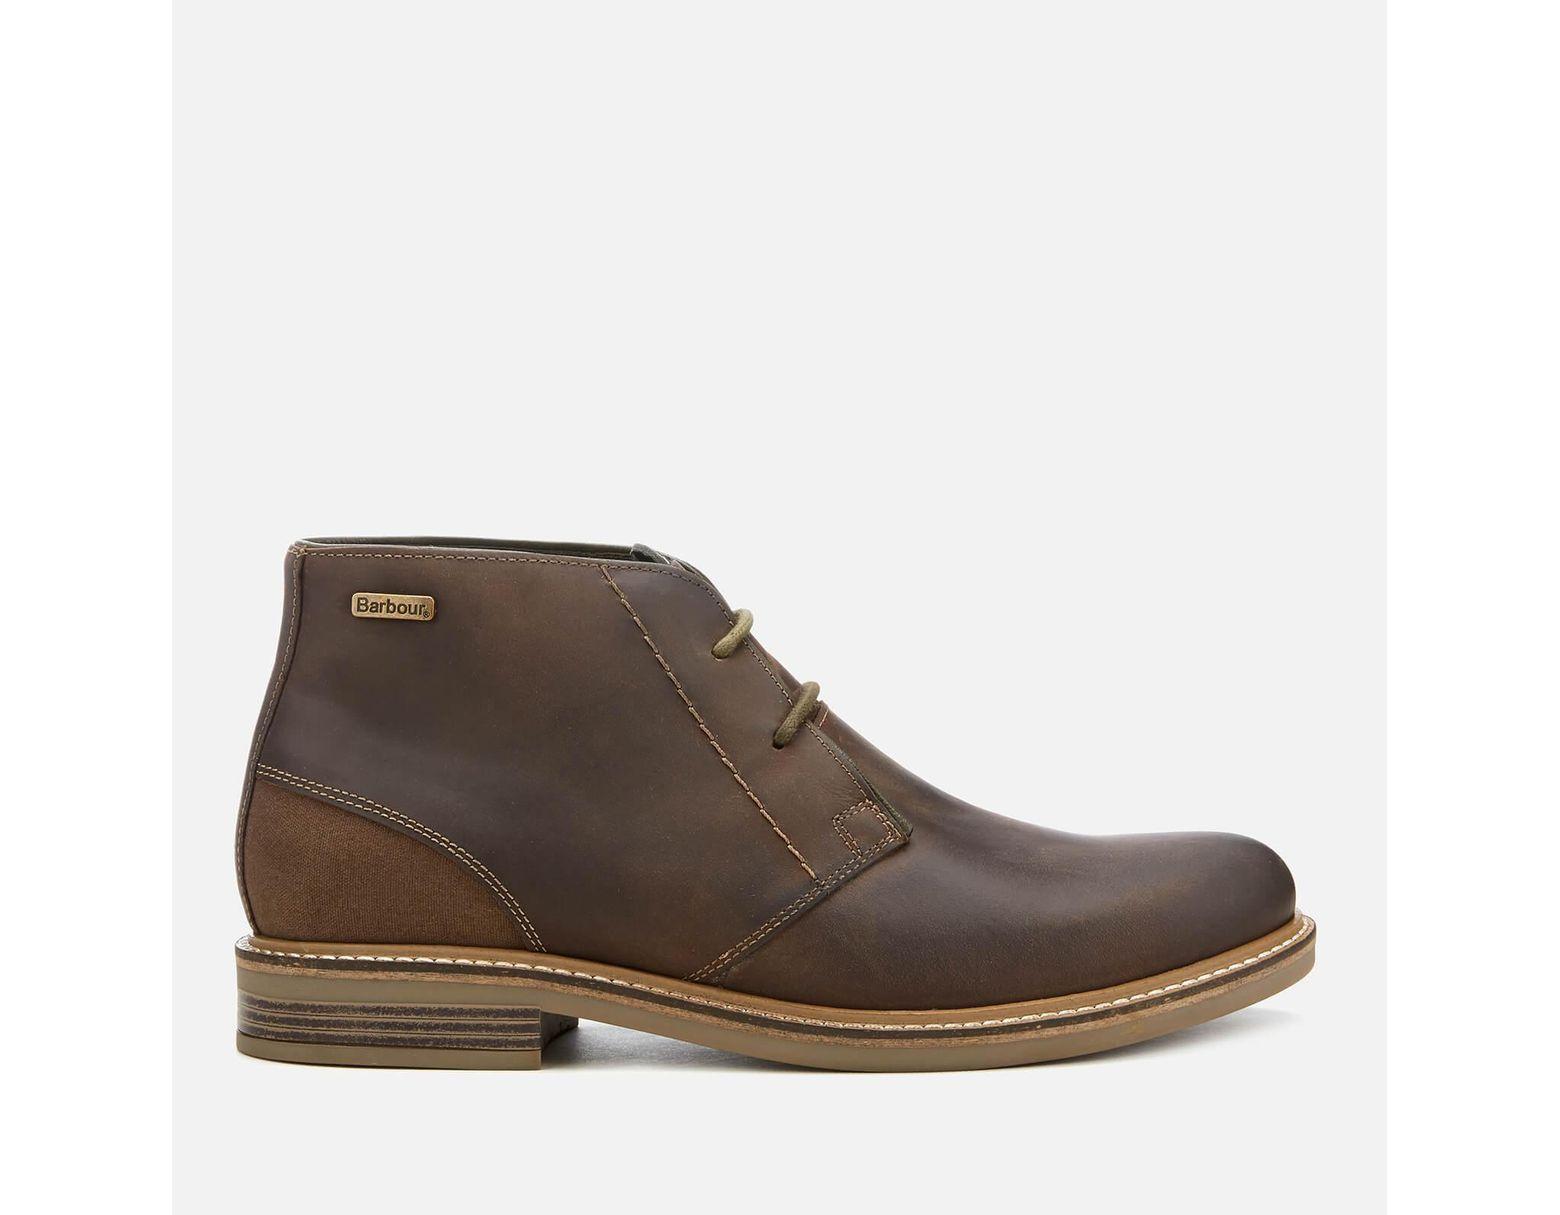 975b14aca51 Men's Brown Readhead Leather Chukka Boots